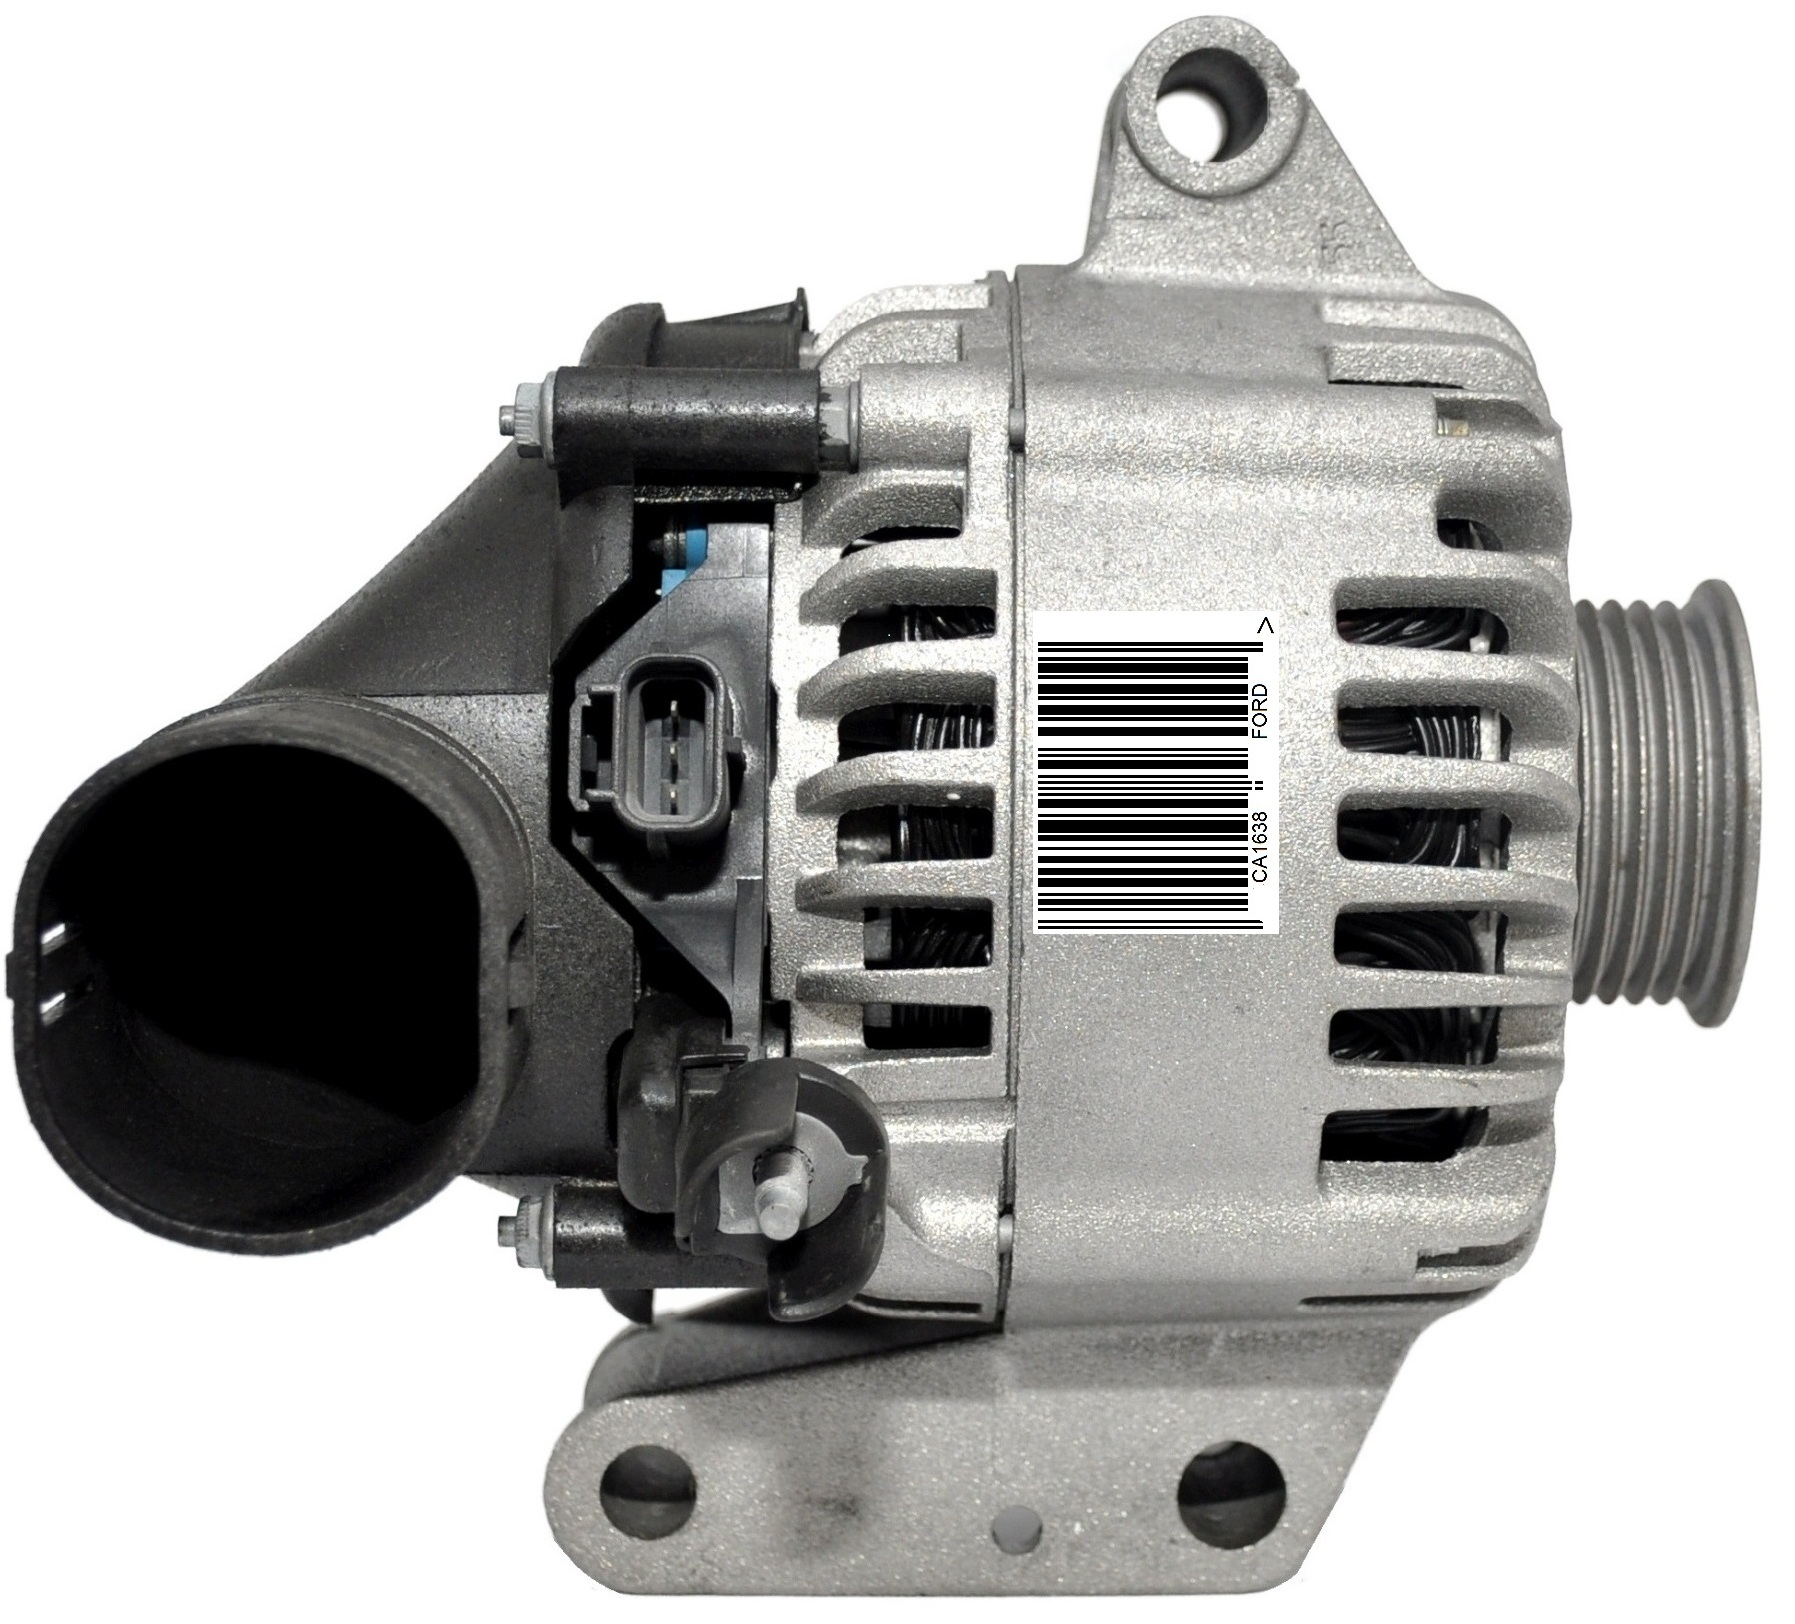 ca1638 генератор ford mondeo 18 20 ди tdci tddi